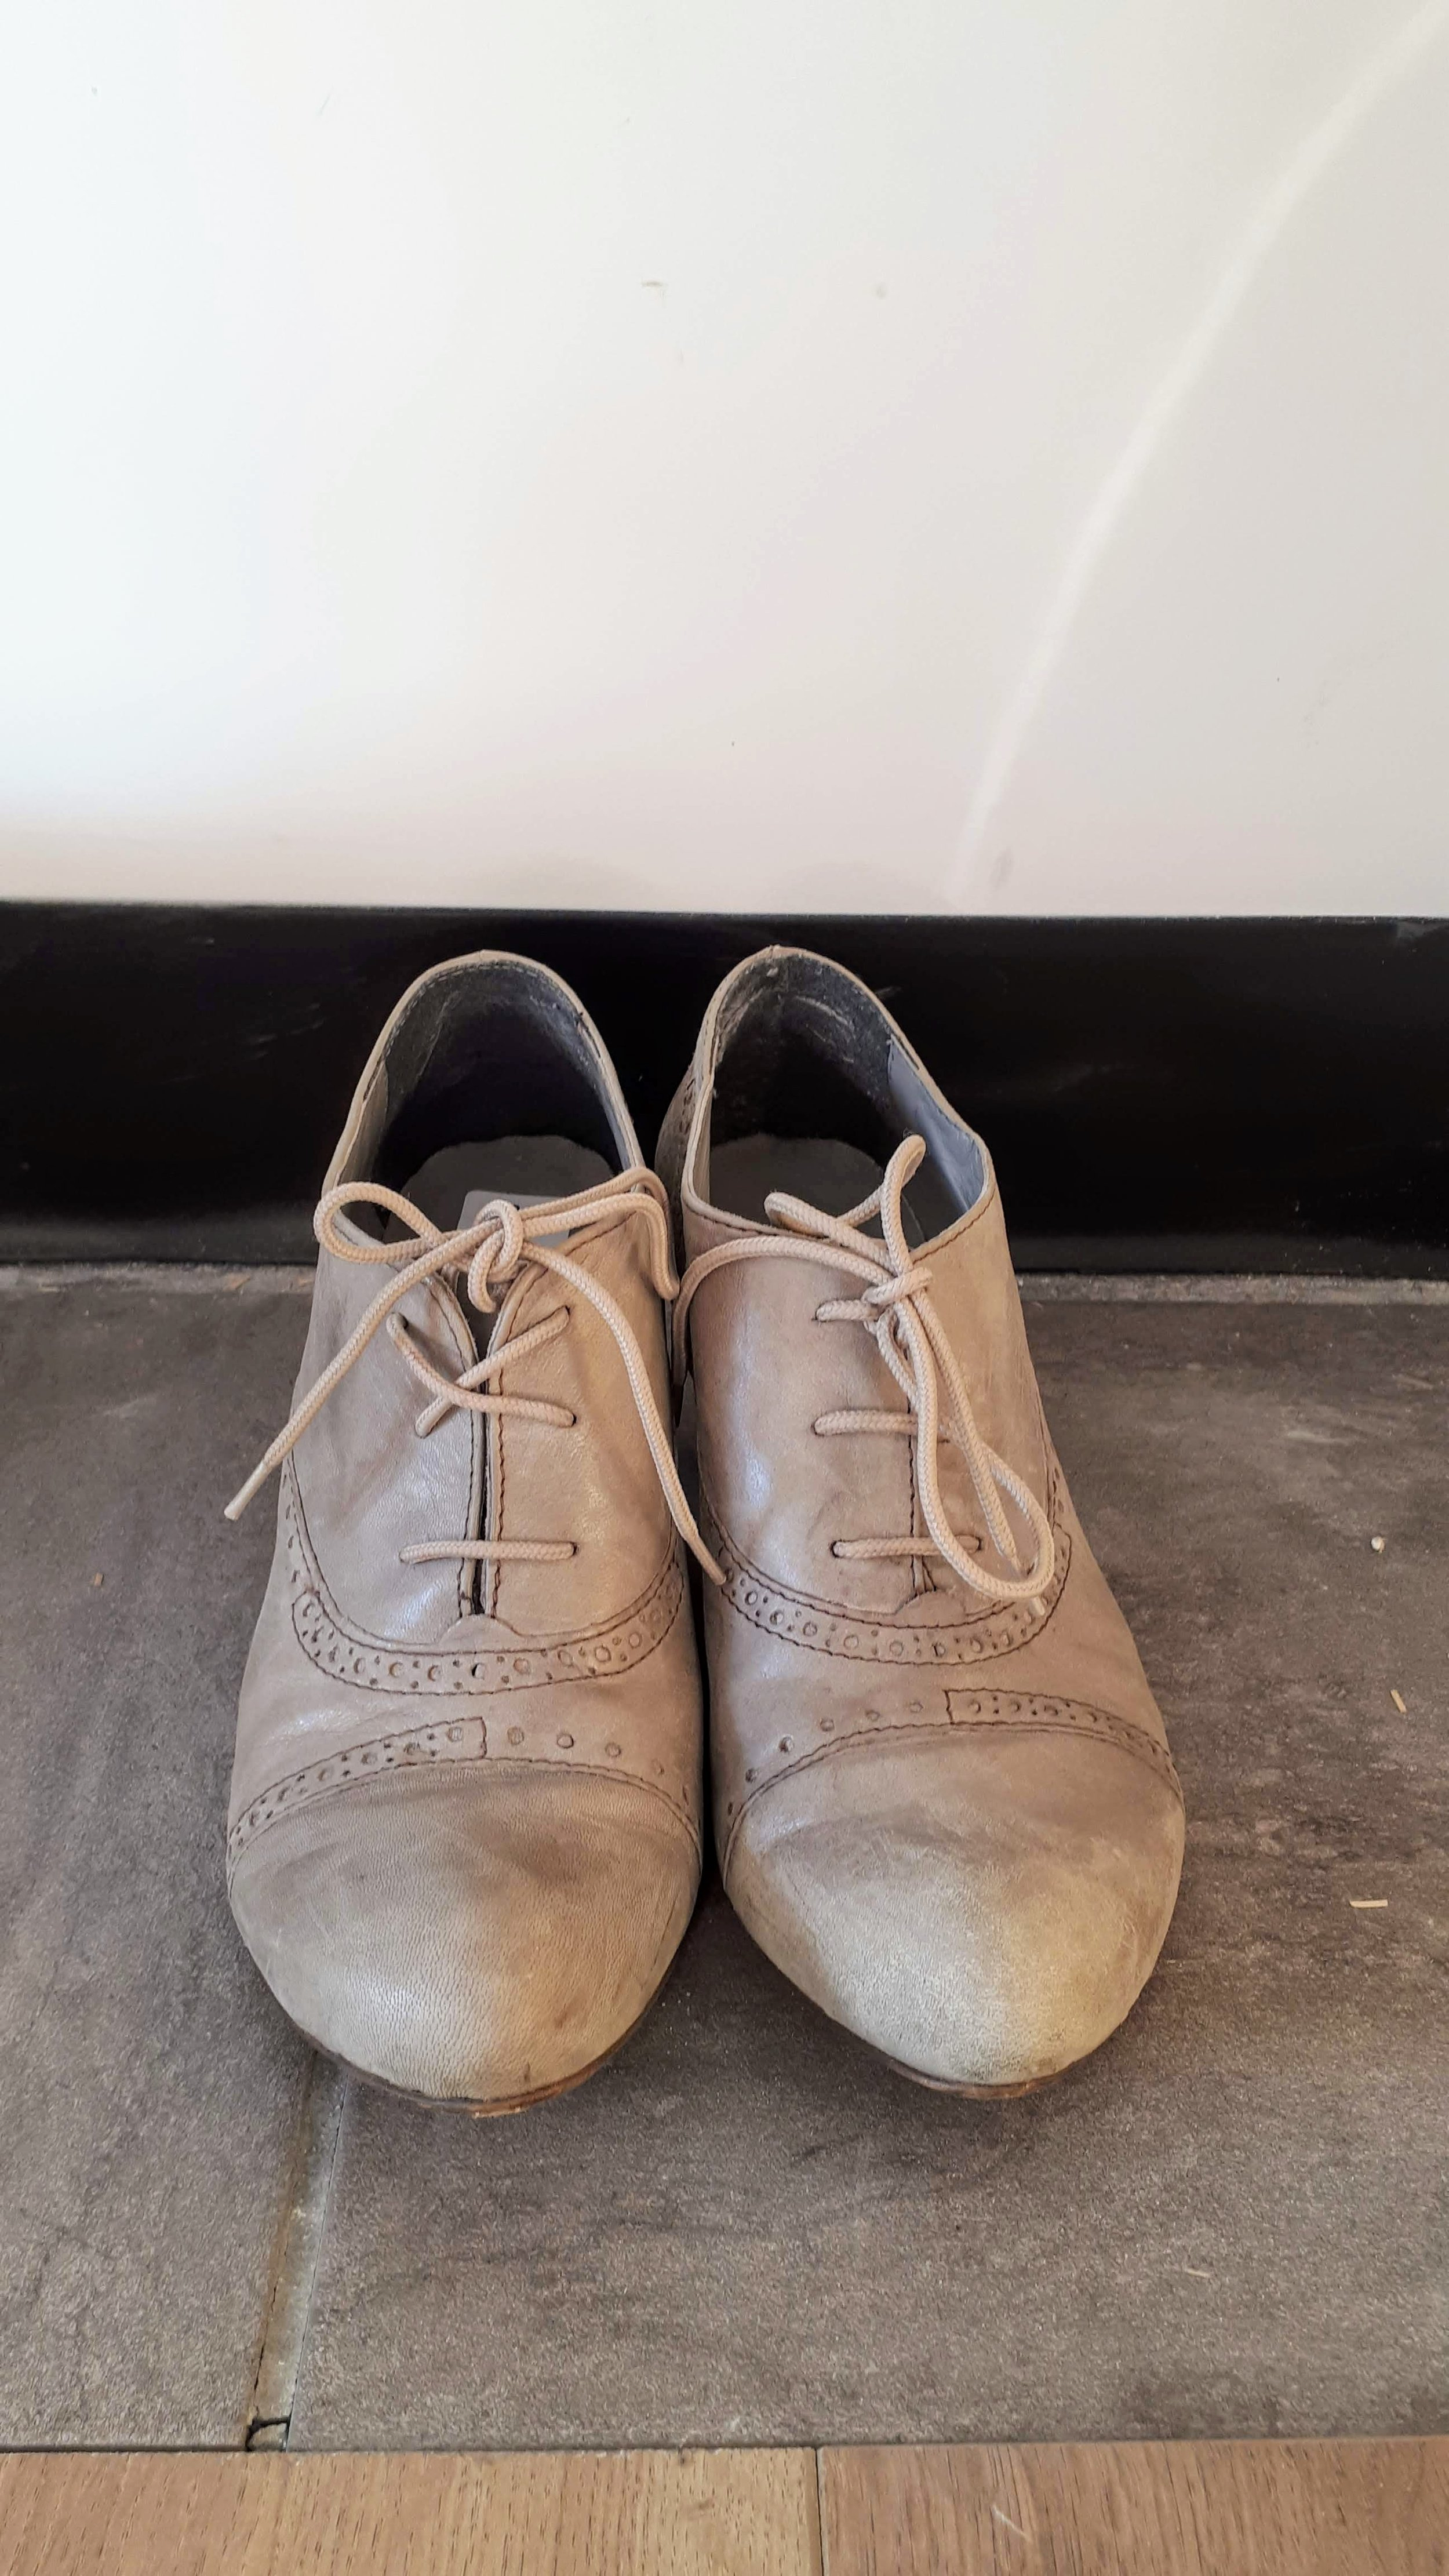 Italian shoes; Size 7.5, $38